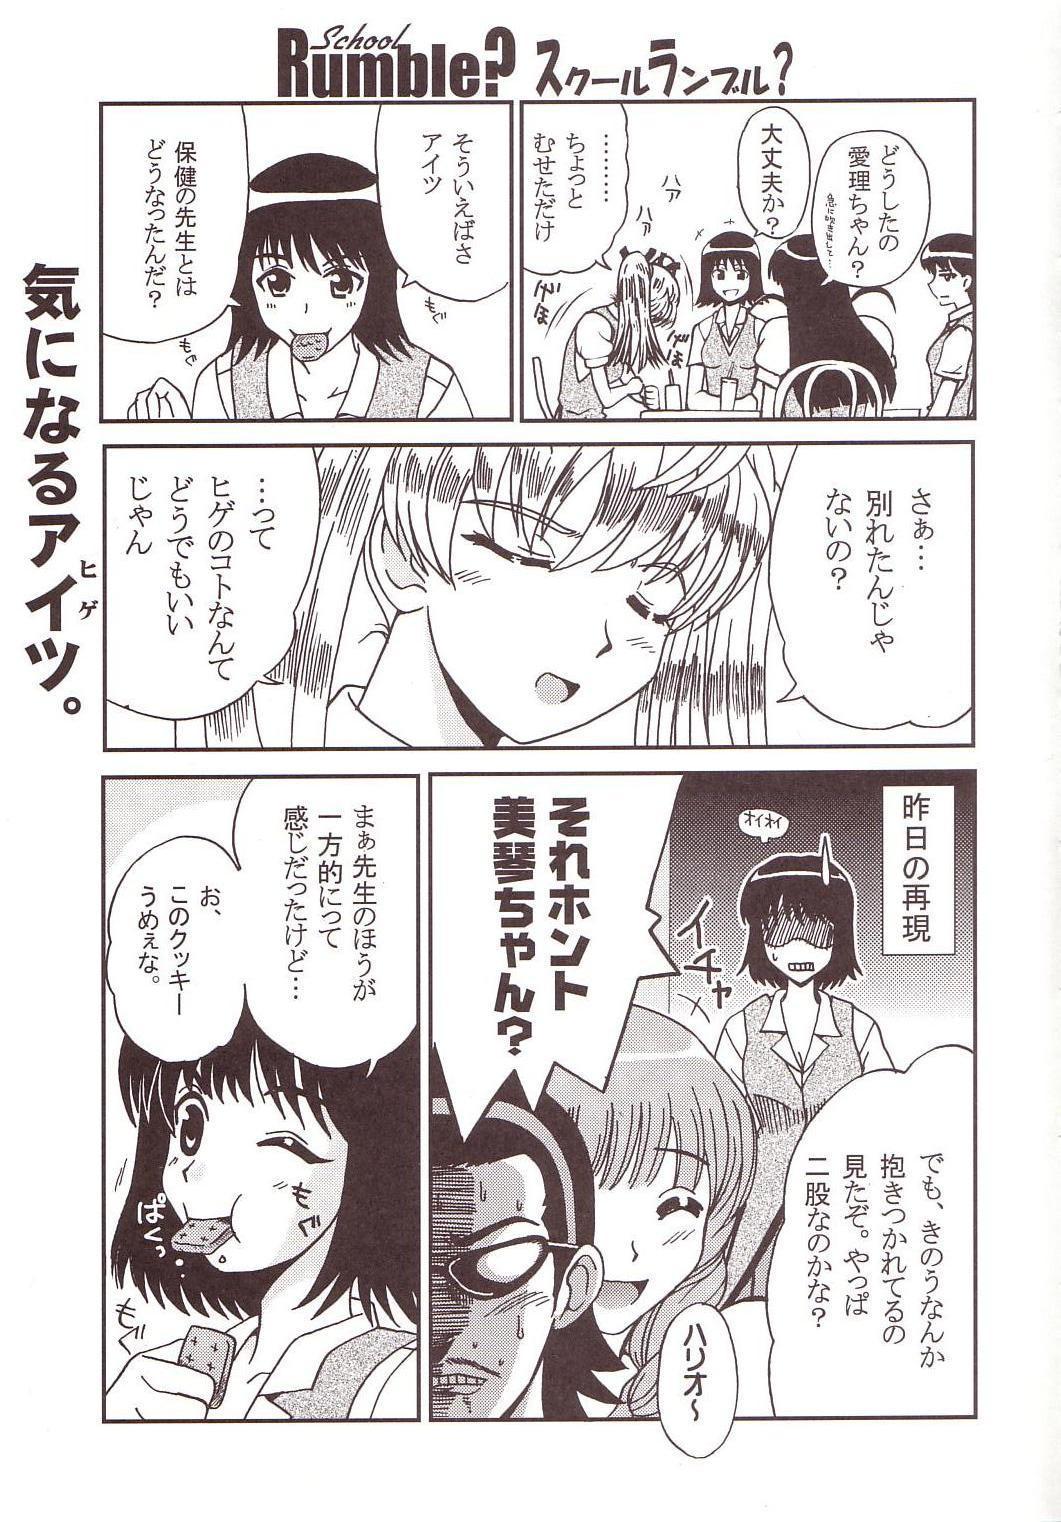 Nakadashi Scramble 4 19